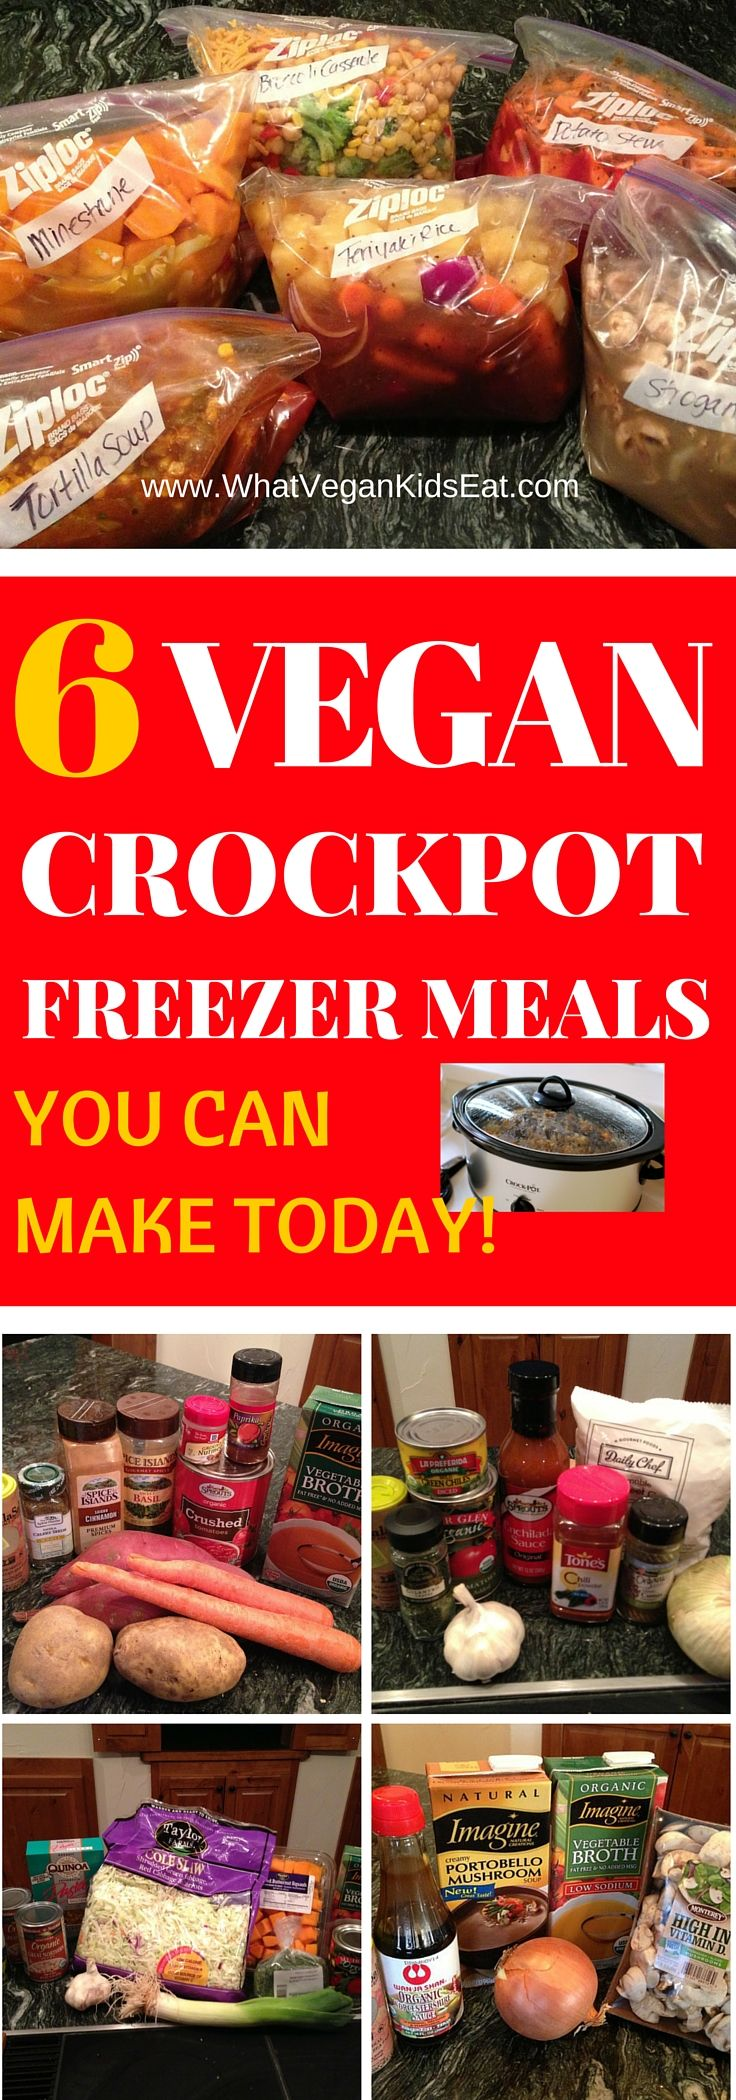 Super Easy Crockpot FREEZER meals that are VEGAN!